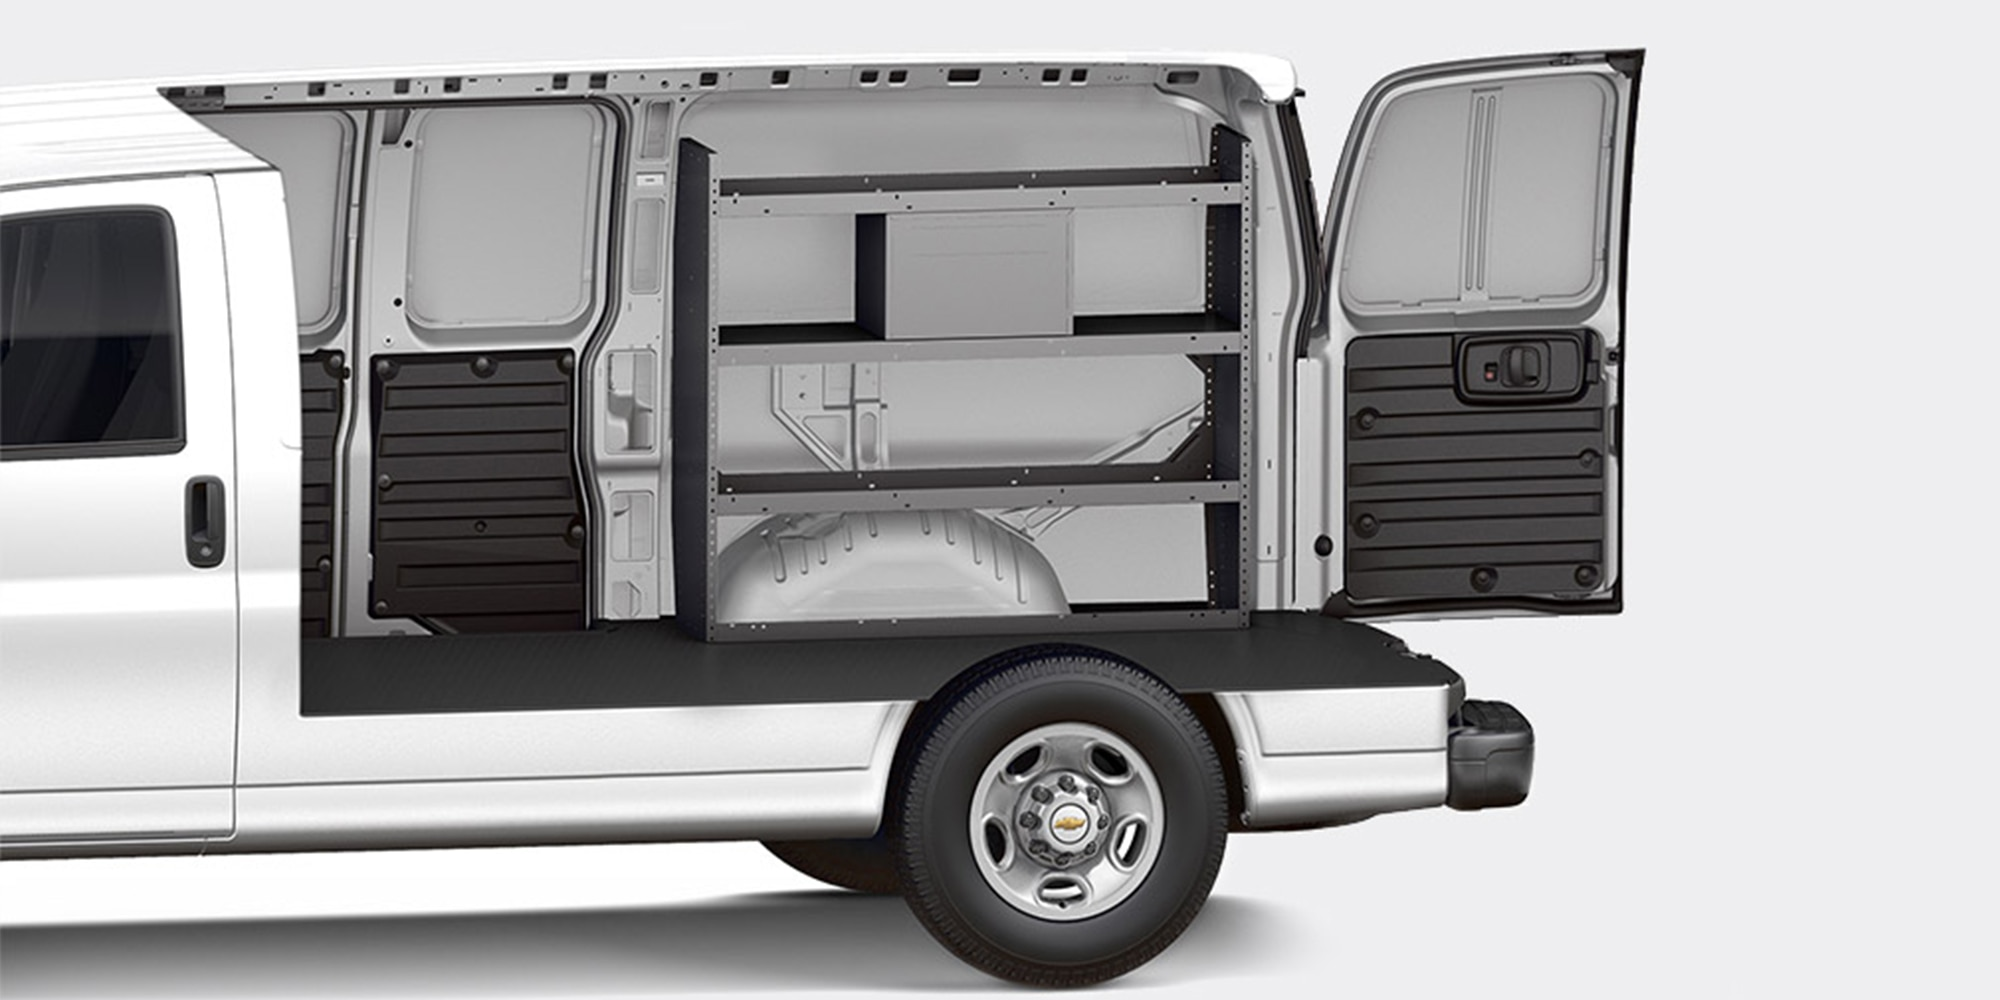 Vans Chevy Express 2021 | Carga y pasajeros